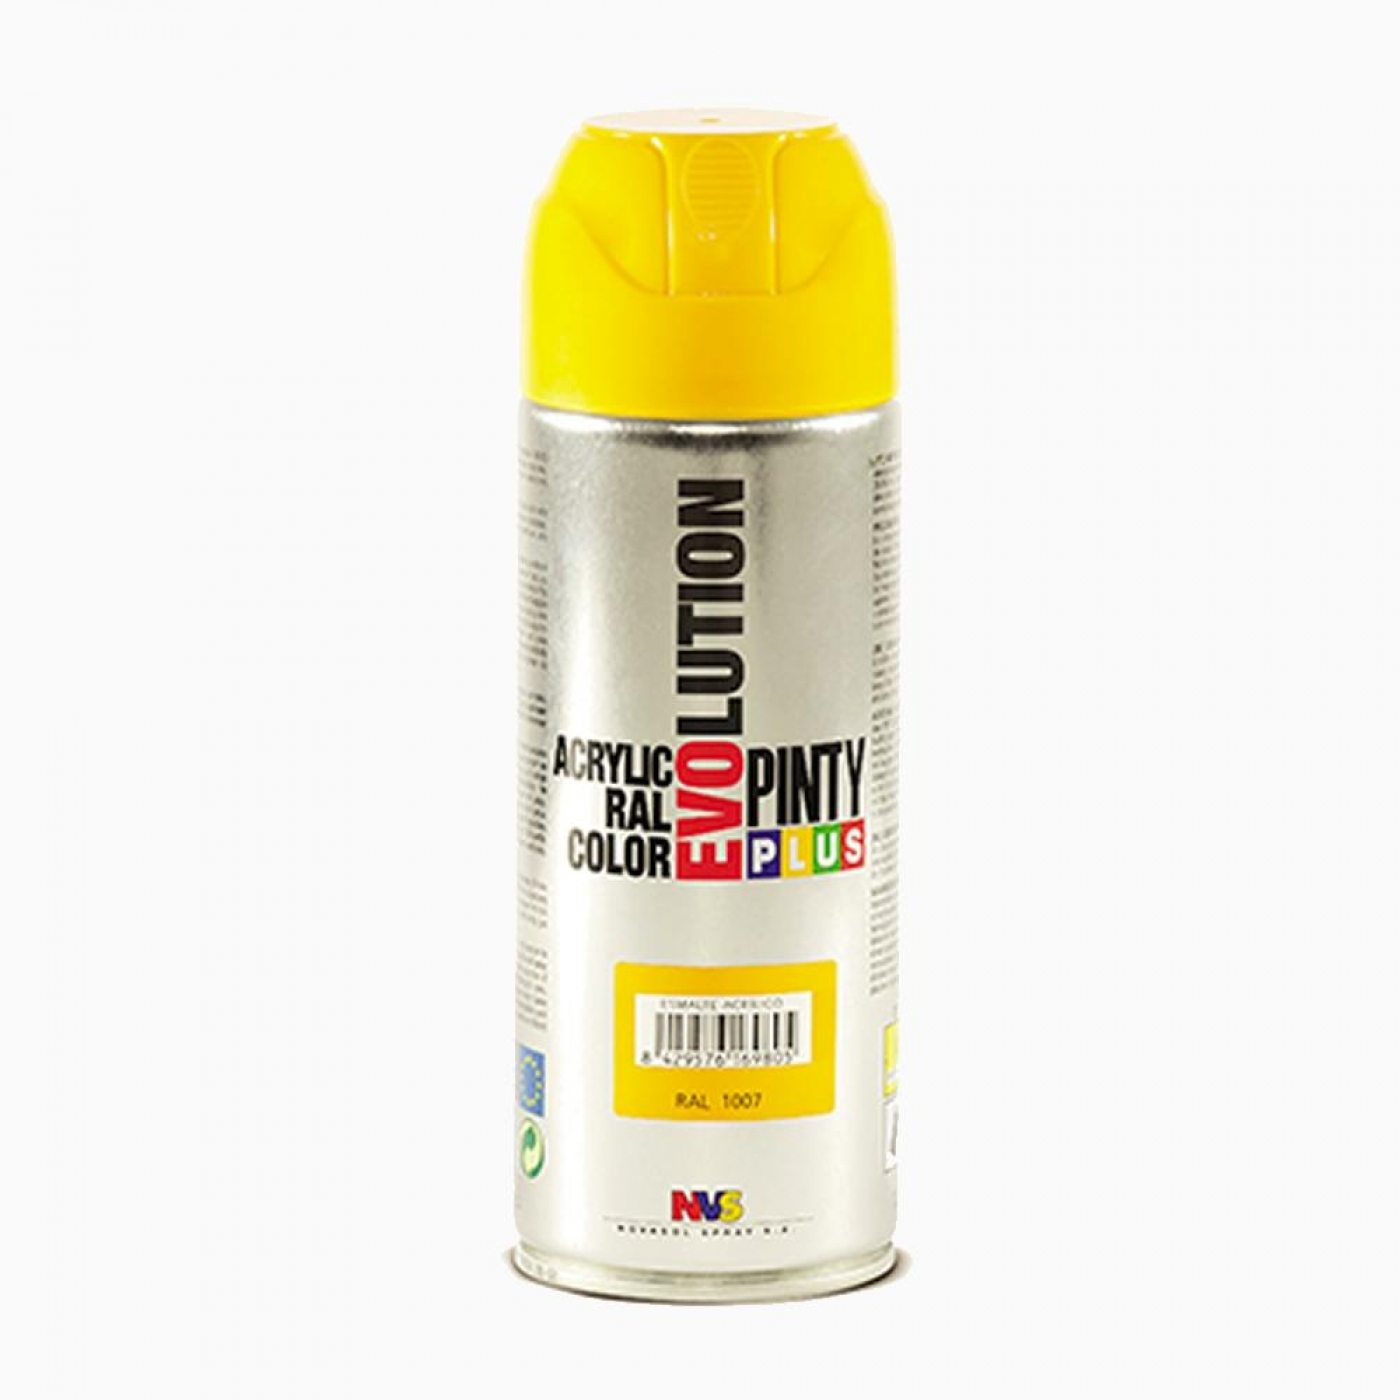 Pintura en spray evolution barniz 400 ml por 4 95 en - Spray pintura acrilica ...